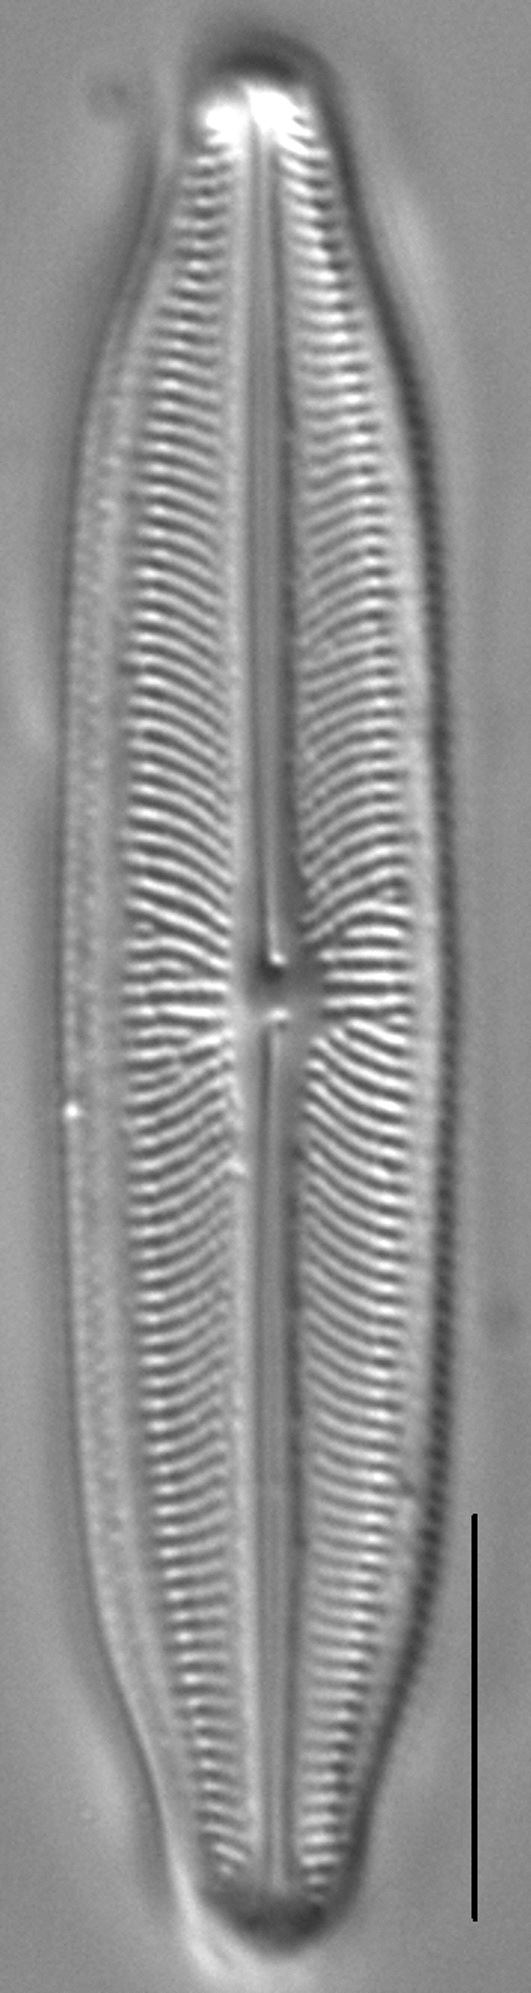 Neidiopsis weilandii LM6